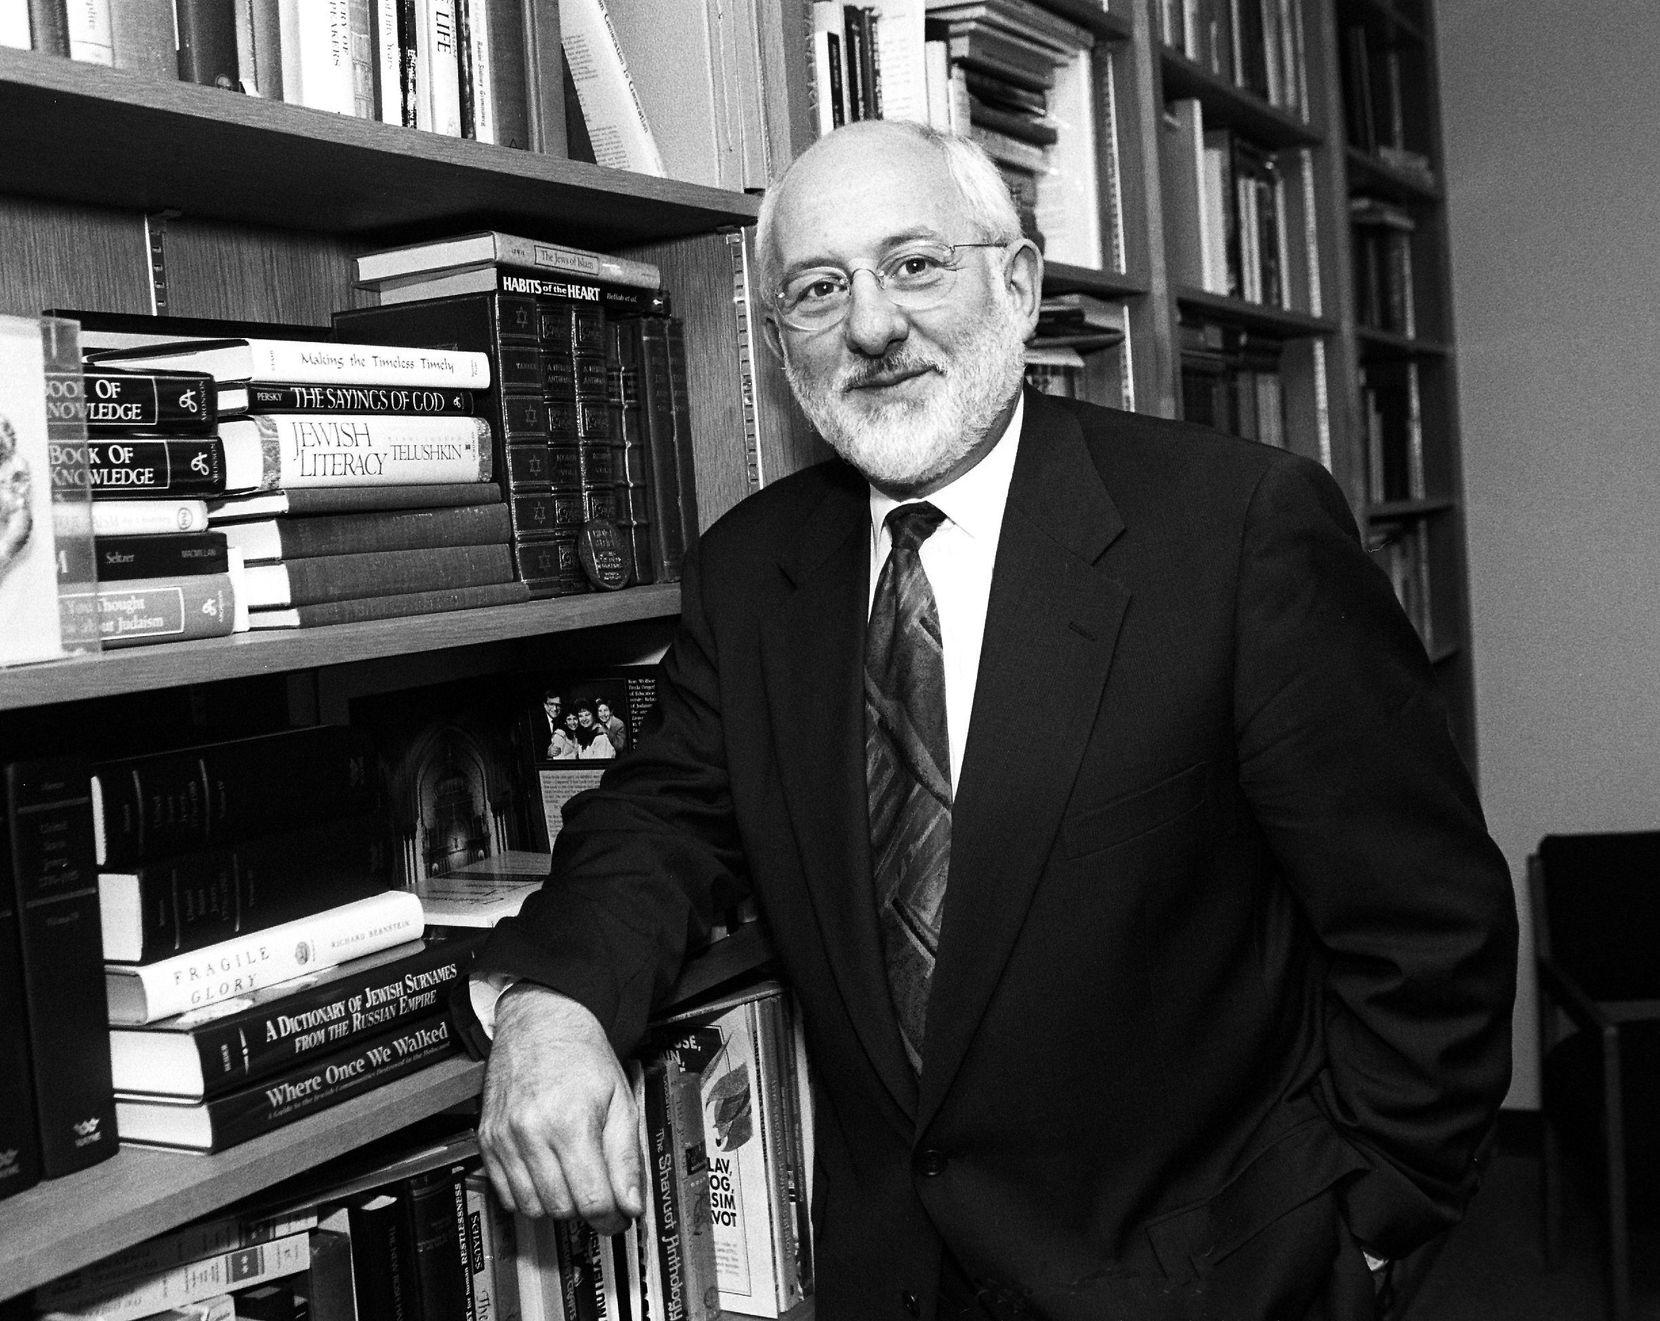 Rabbi Sheldon Zimmerman in his  office at Temple Emanu-El in 1994.